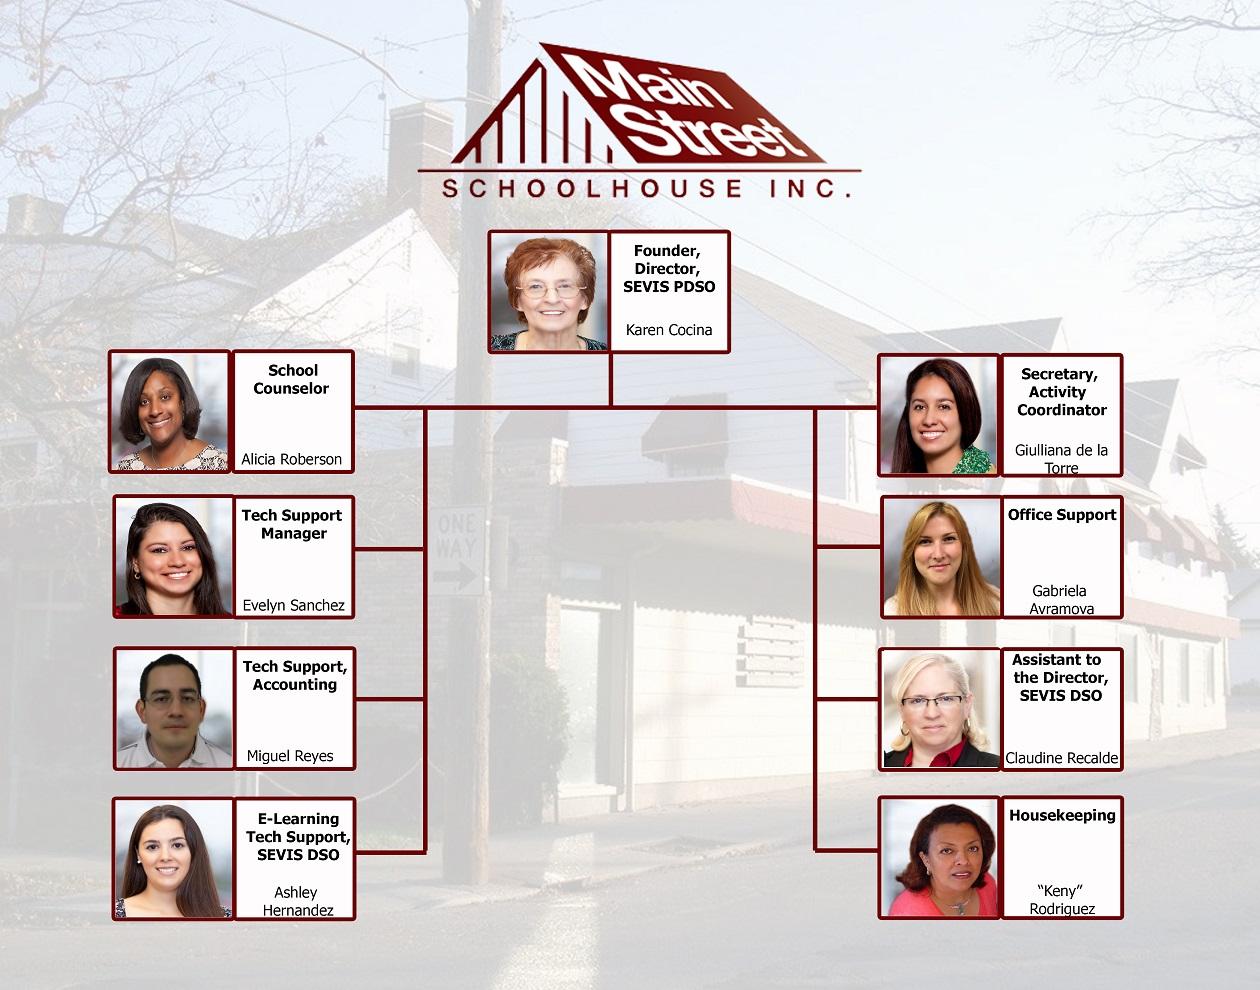 Organization chart main street schoolhouse language institute o1 o2 o3 altavistaventures Choice Image